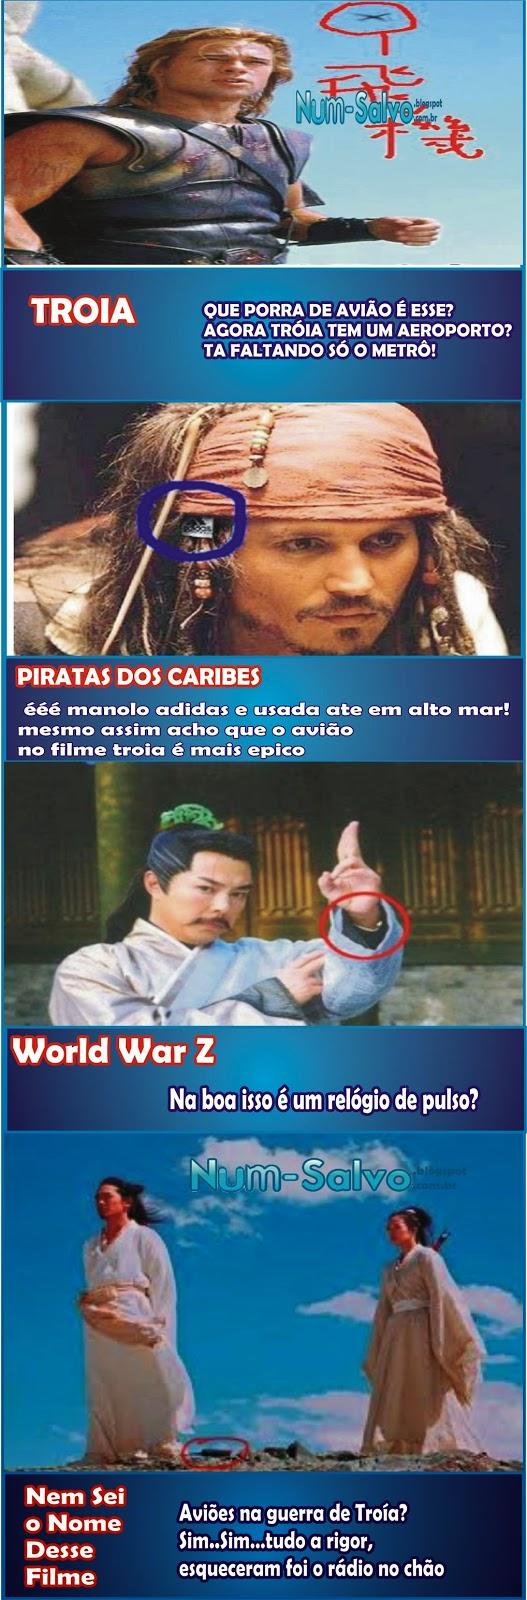 Os piores erros nos filmes antigos , troia , piratas do caribe